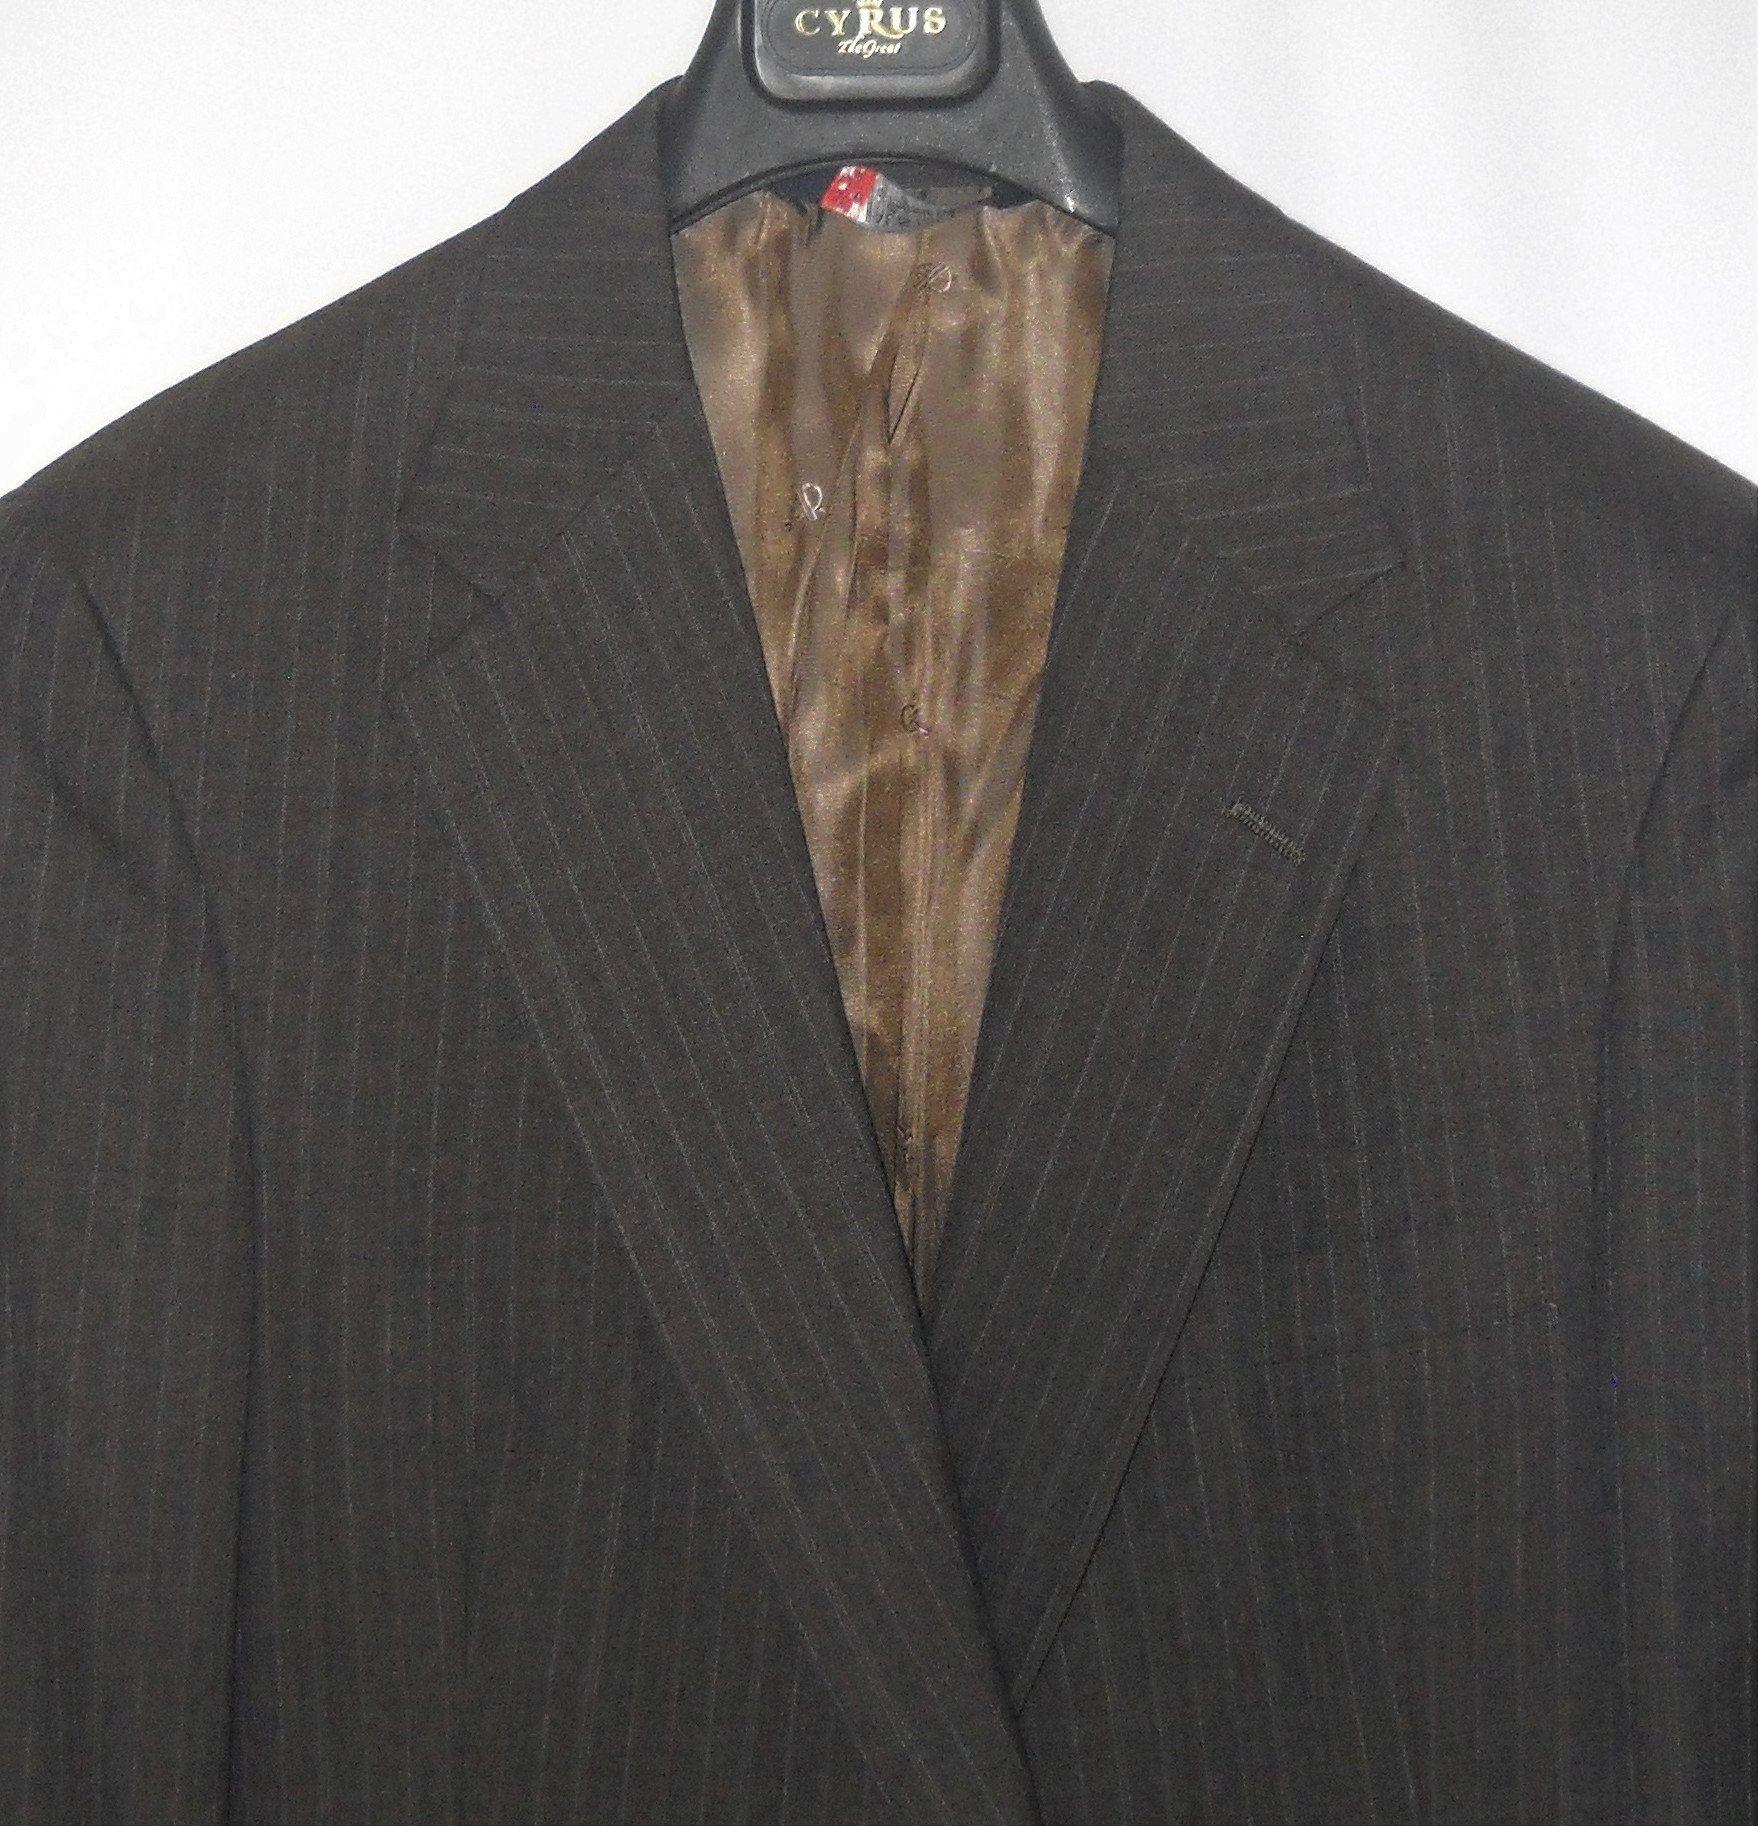 44r Austin Reed Regent Street Ayrshire Gray Pinstripe 2 Button Etsy In 2020 Brown Pinstripe Cuffed Pants Austin Reed